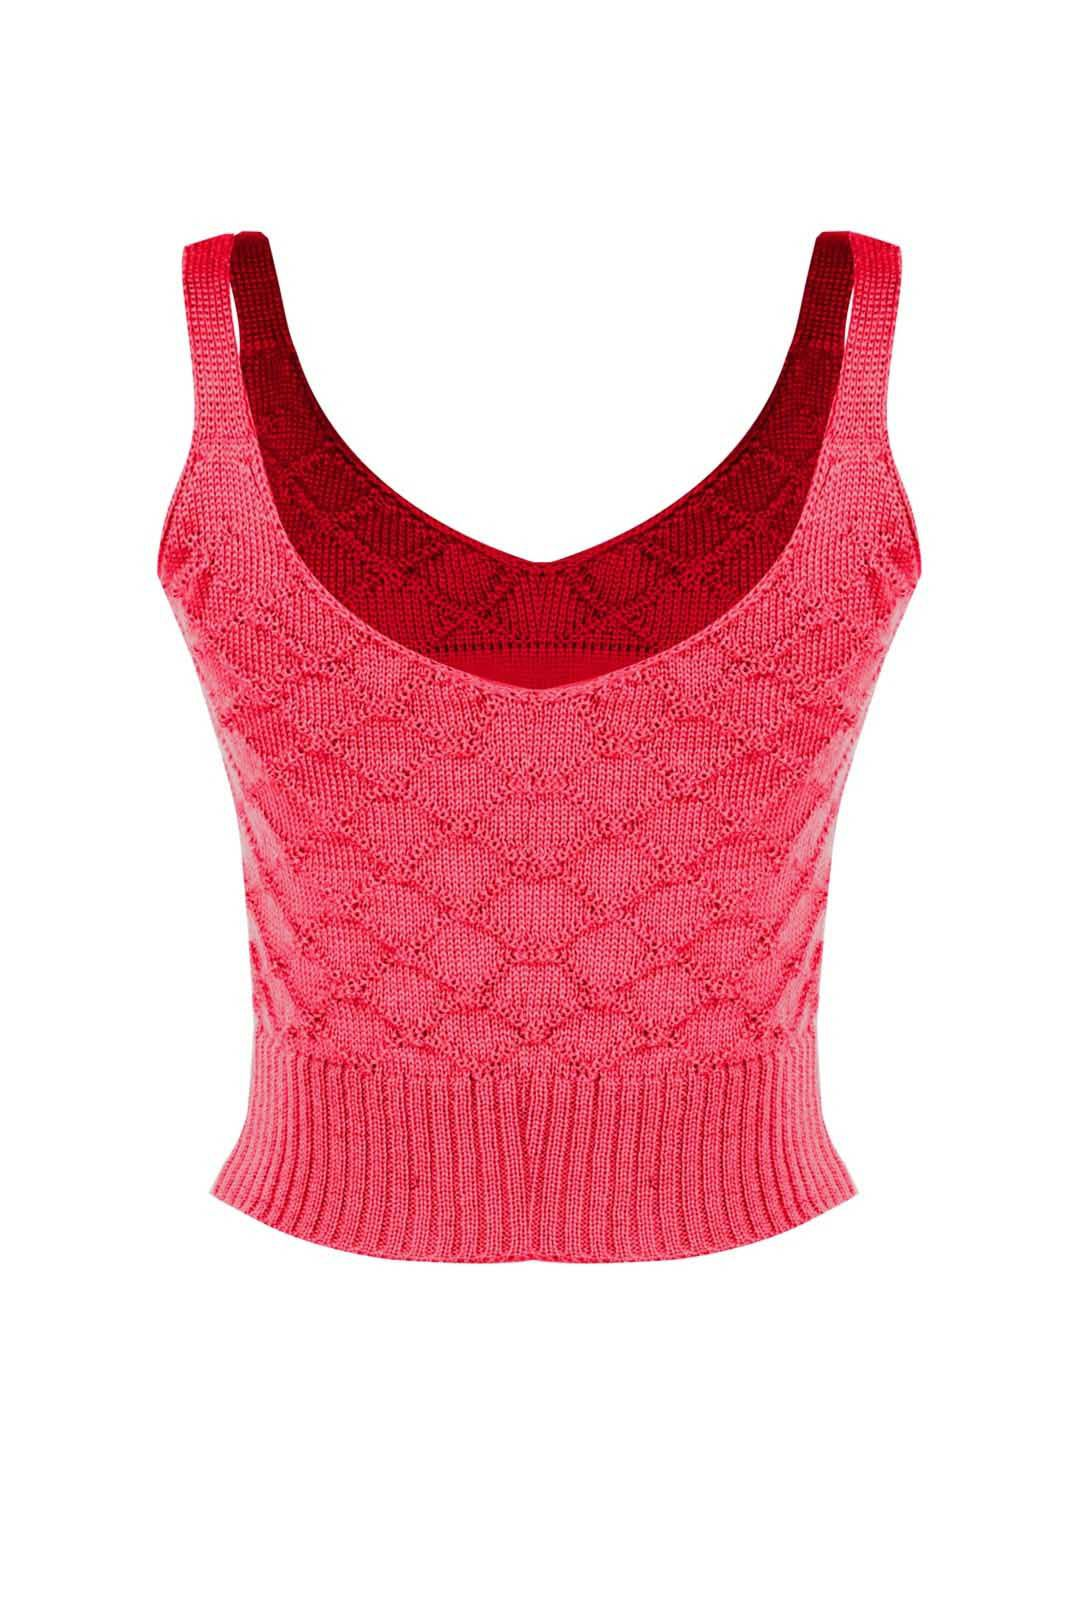 Top Outlet Dri Cropped Tricot Estampado Estampa Ranço Pink